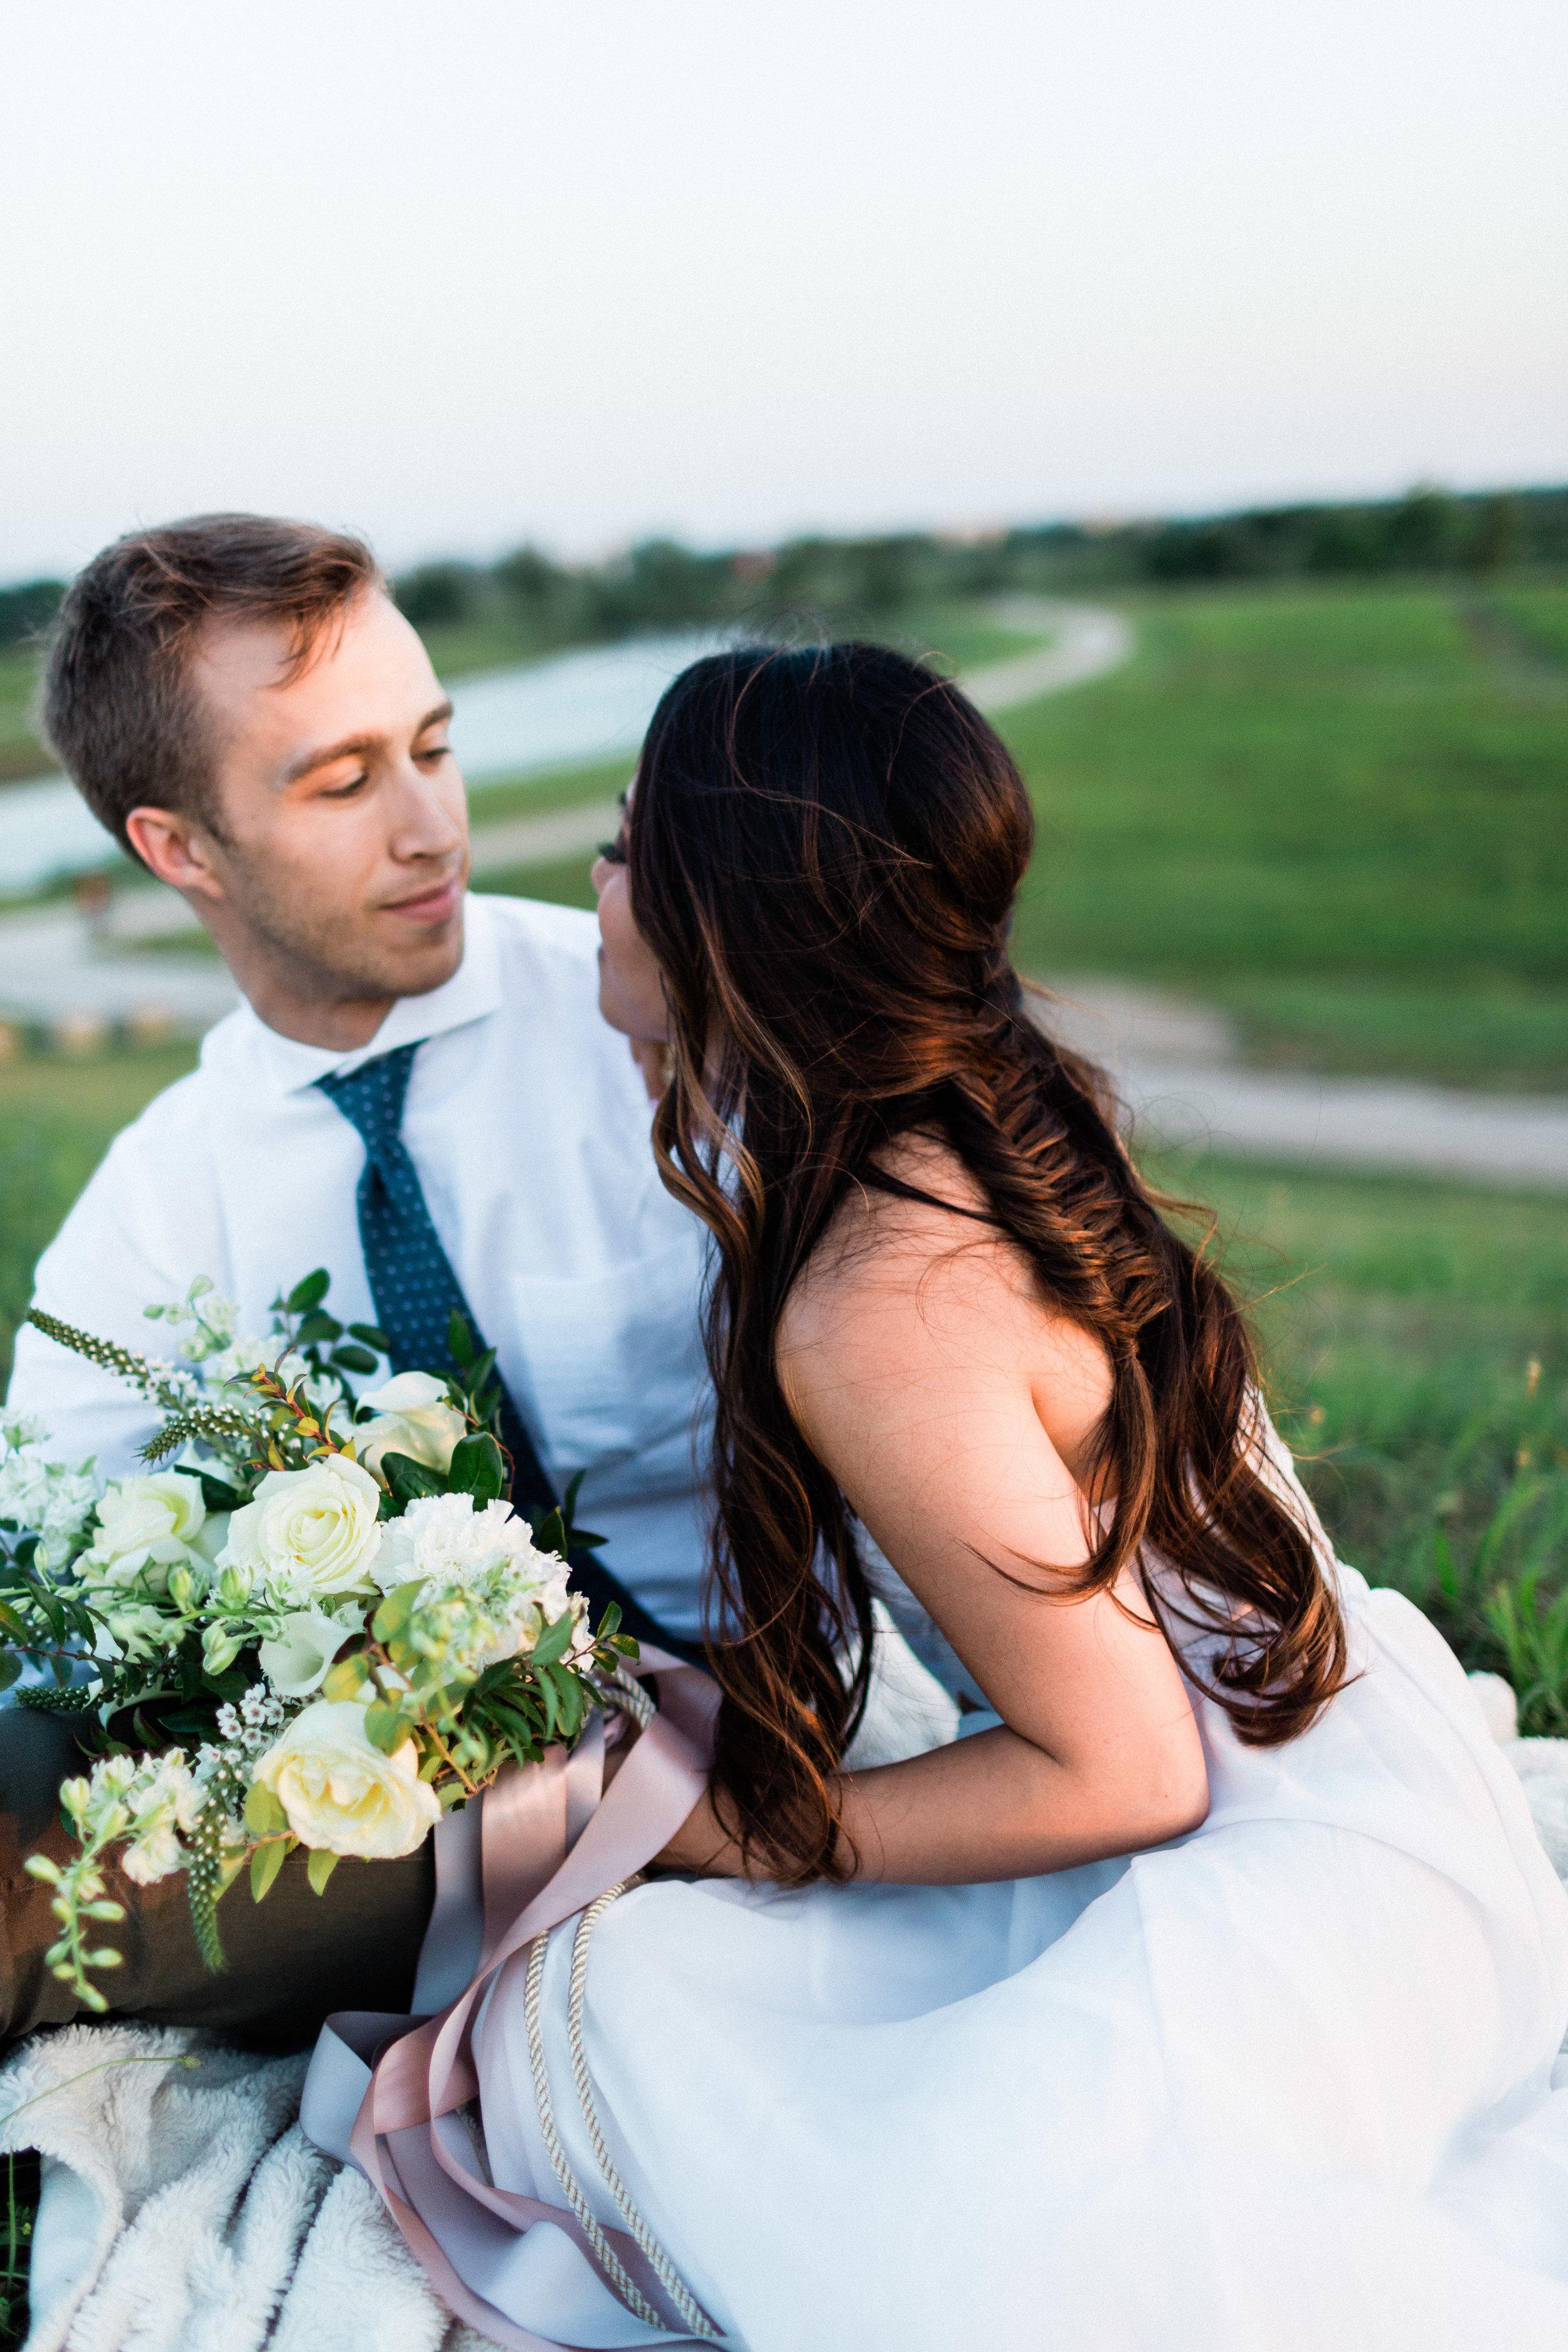 Dallas small wedding inspiration (22 of 24).jpg